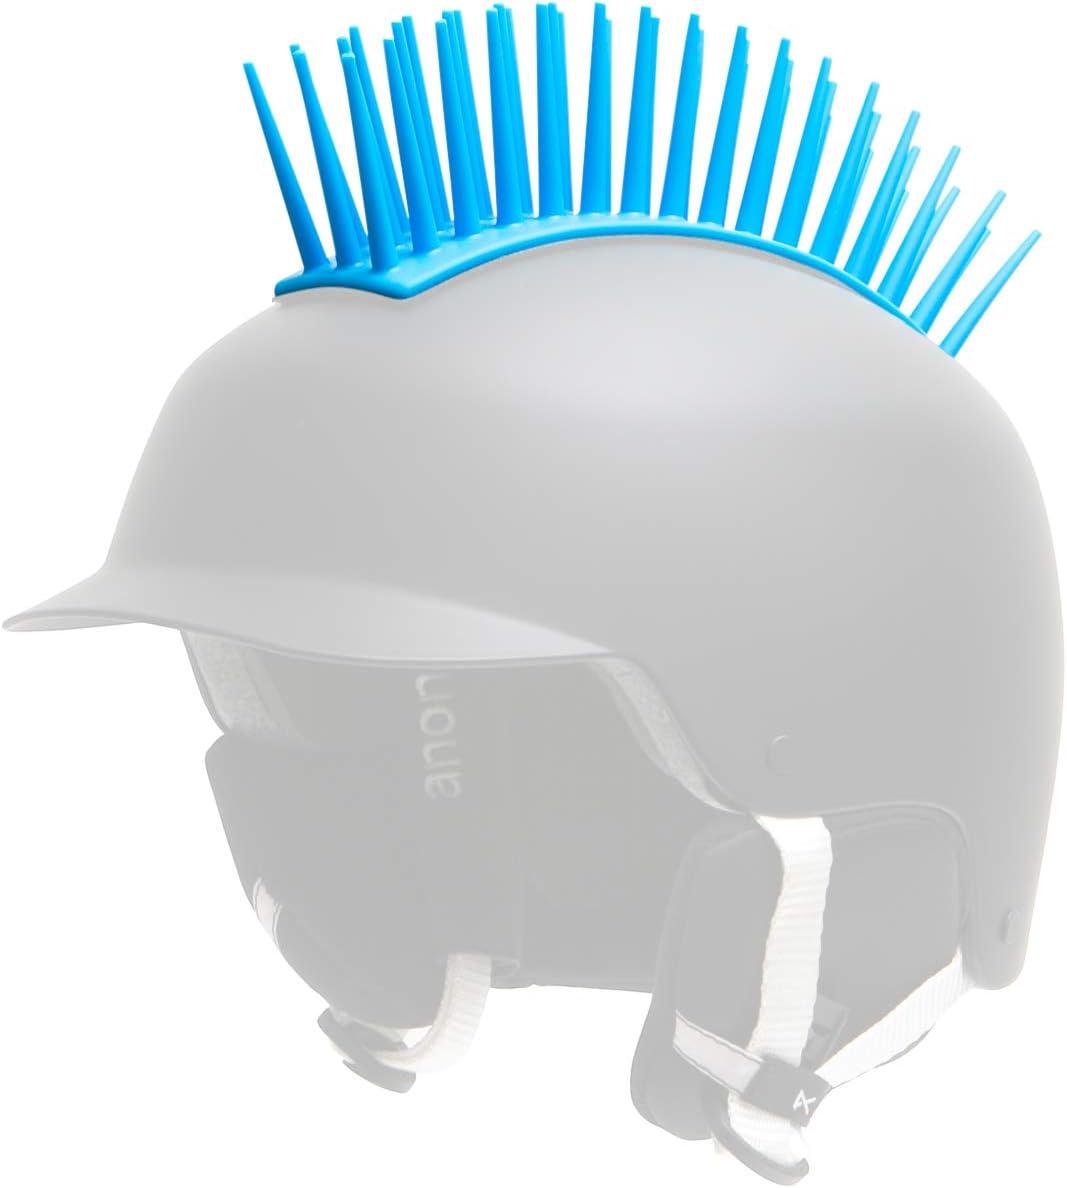 Blue Mohawk (Helmet not Included)